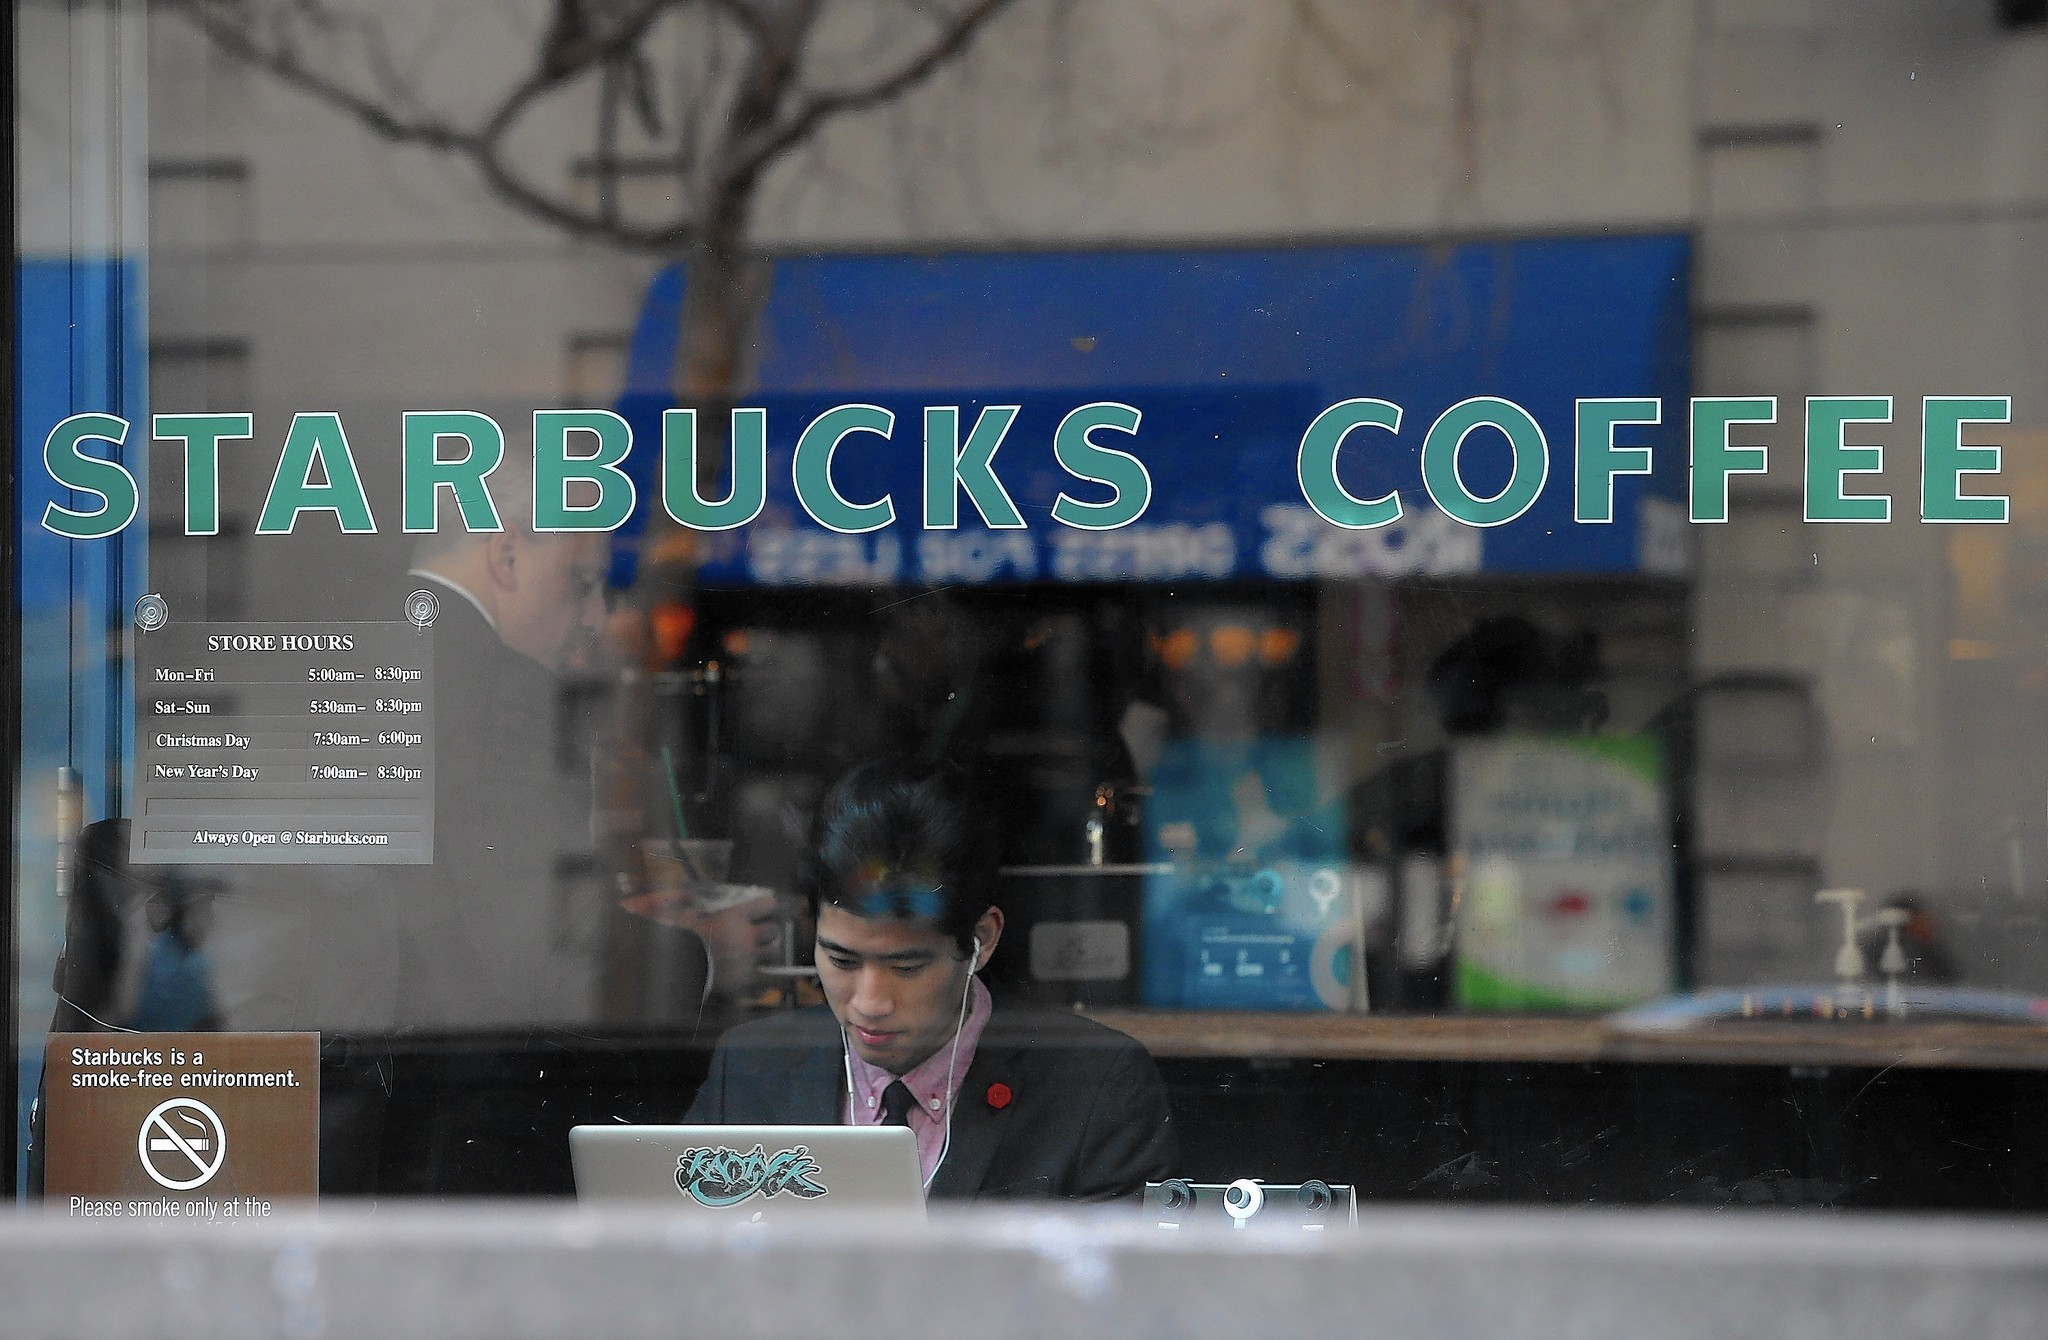 Starbucks adds tiramisu latte, coconut milk and coffee subscription service